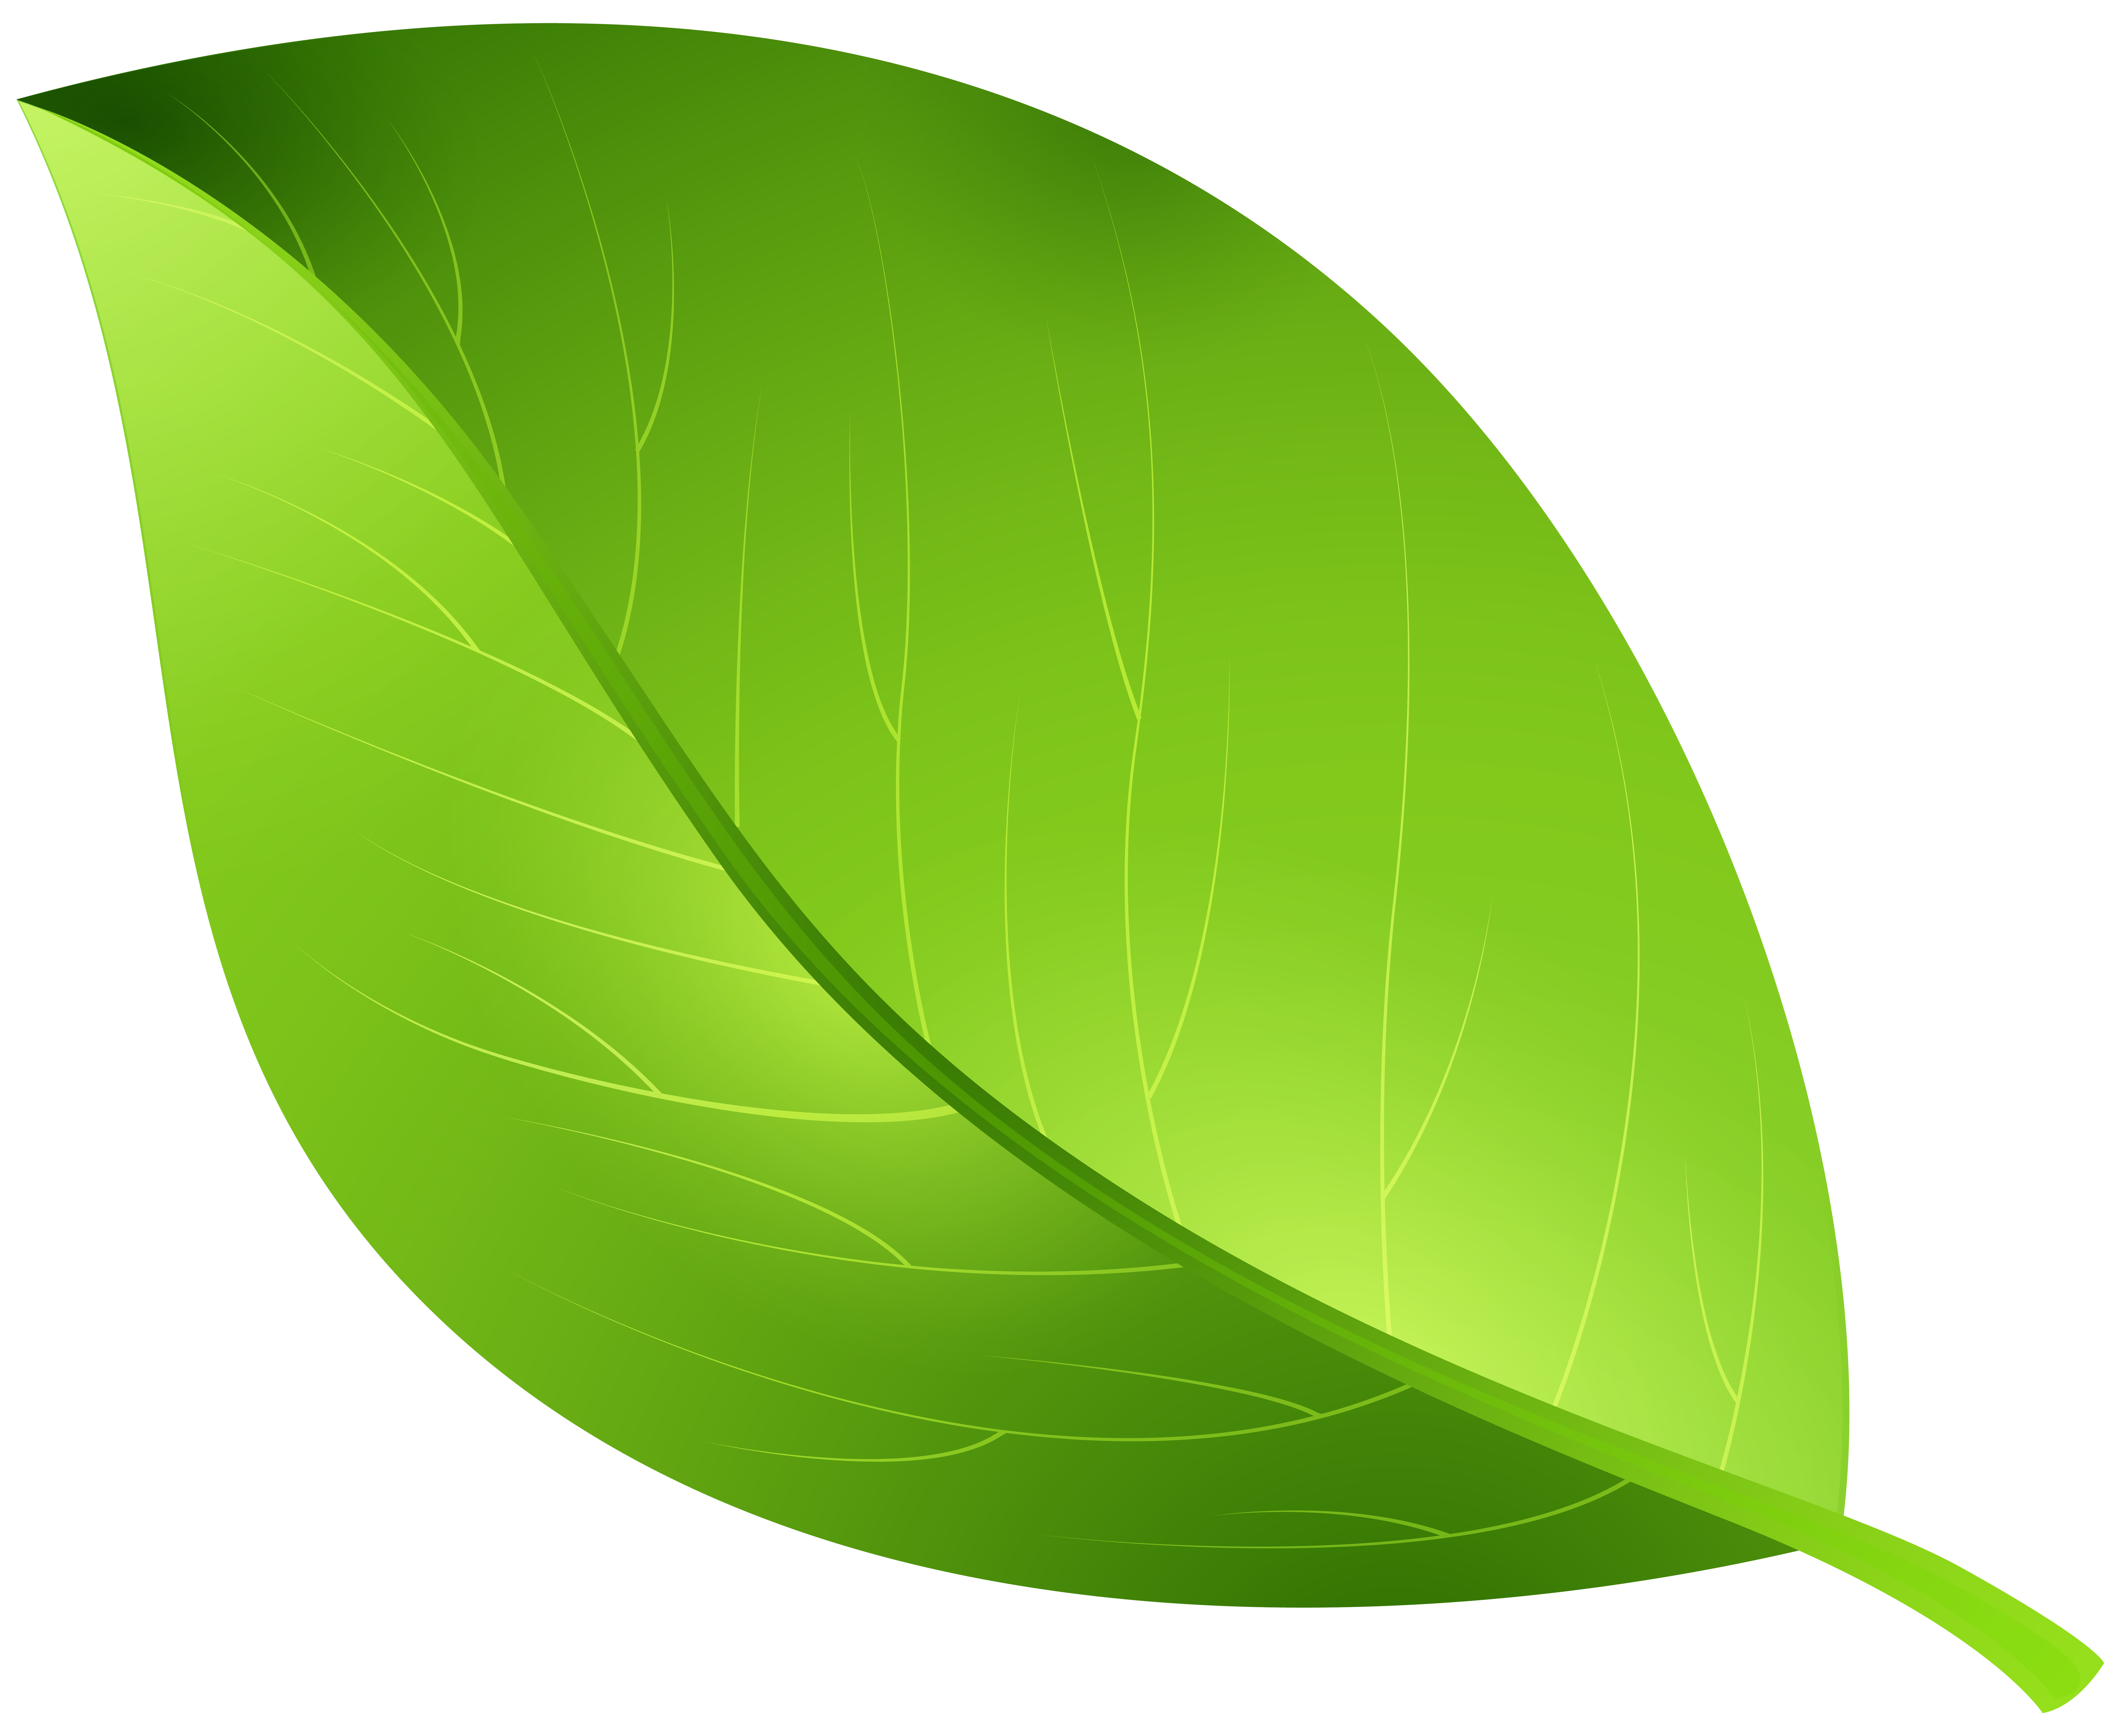 Leaf clipart transparent background. Cartoon green png clip